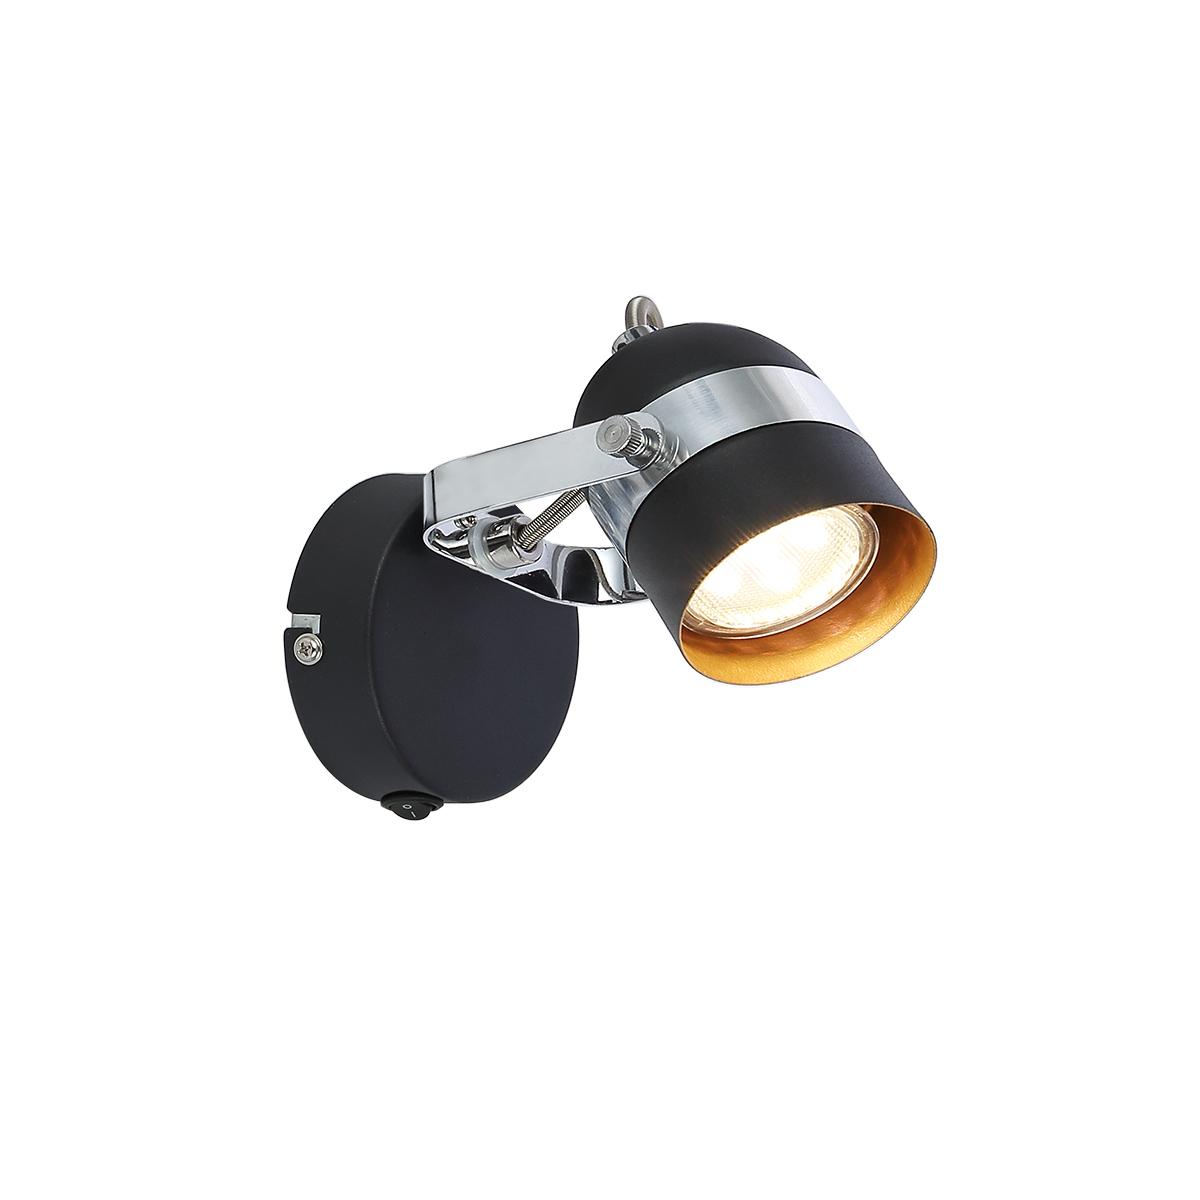 Spot lampa Alex/1  6602051 crna